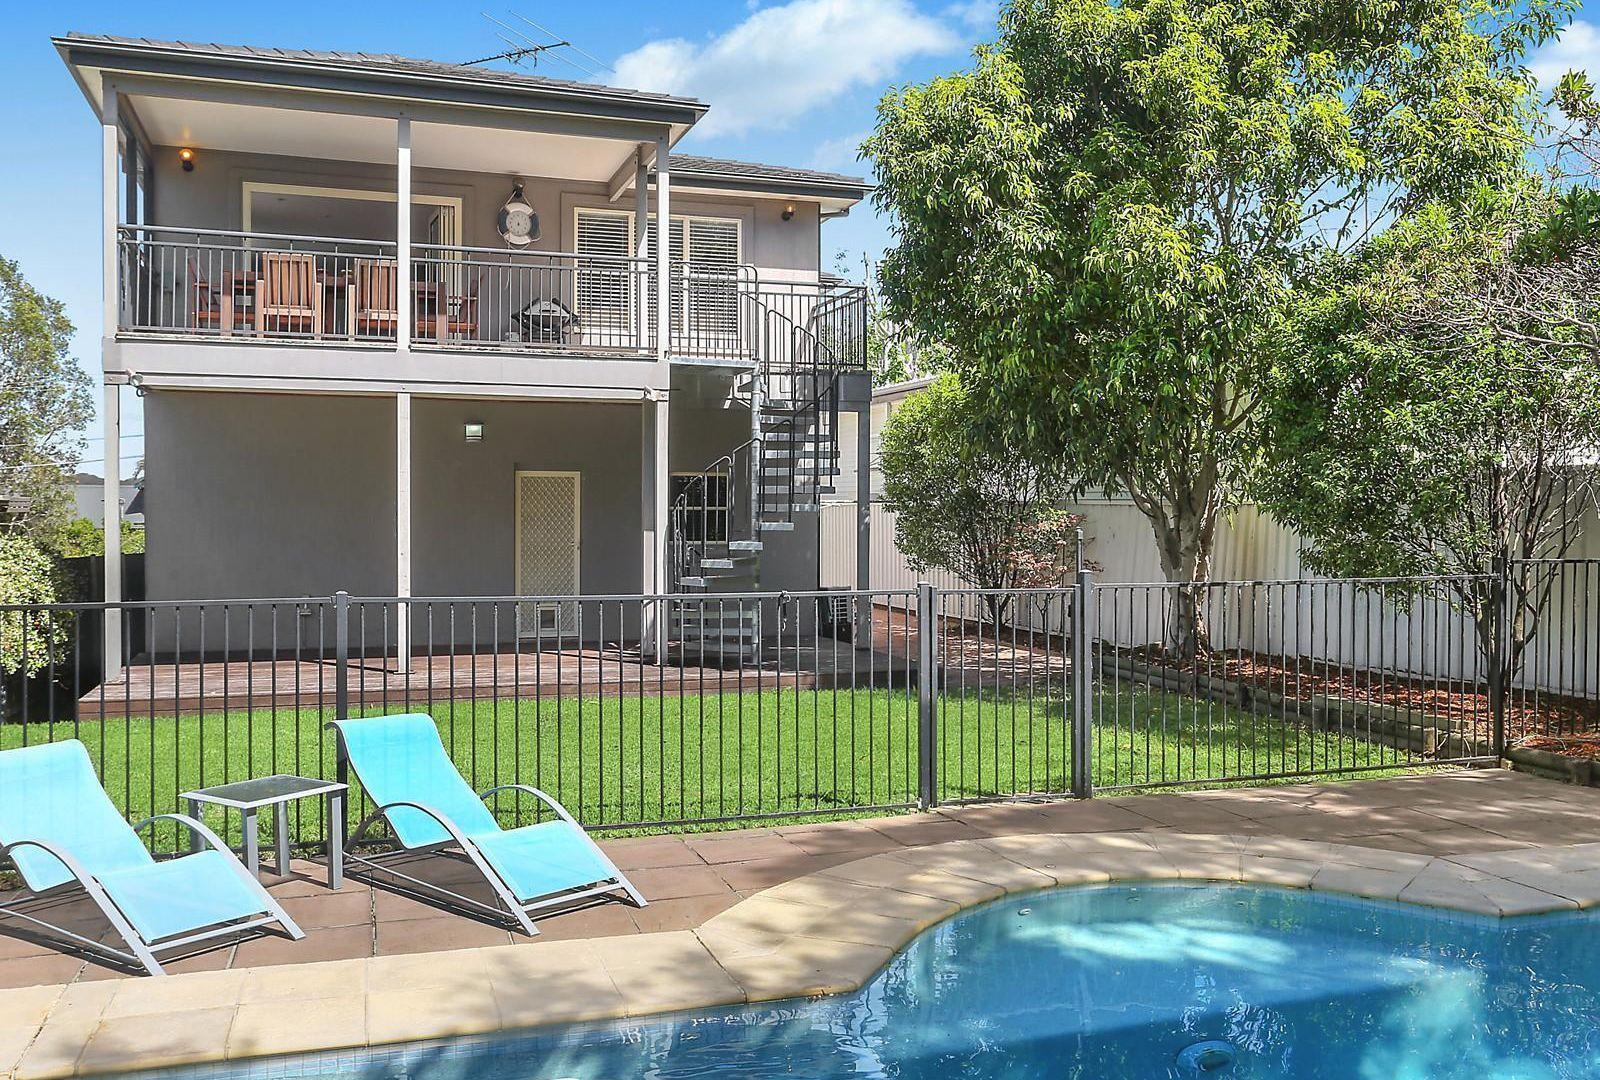 39 Boomerang Road, Collaroy Plateau NSW 2097, Image 1